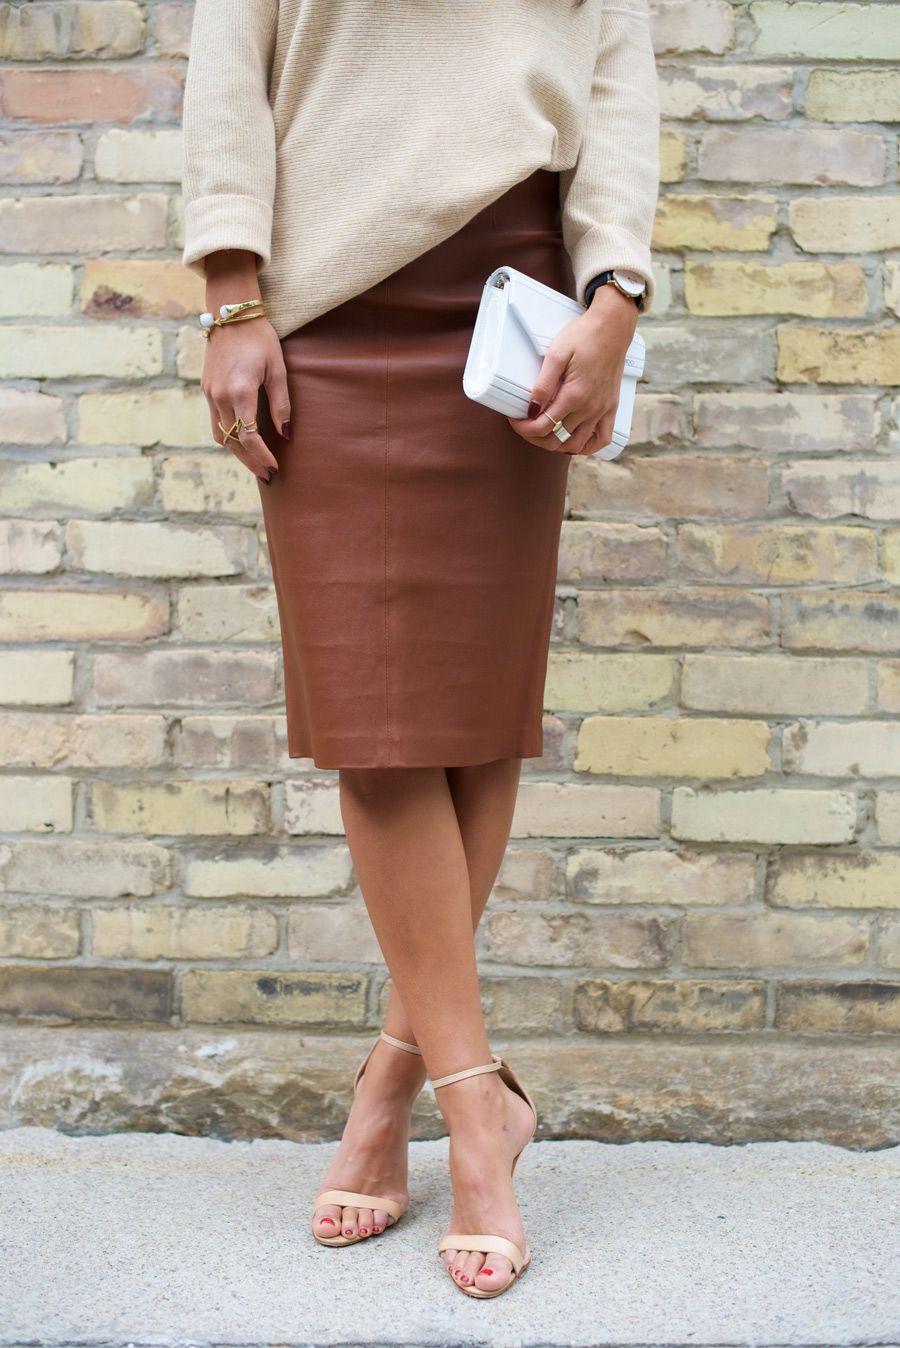 72662de269 Brown Leather Pencil Skirt | Not Your Standard | Women's Fashion ...